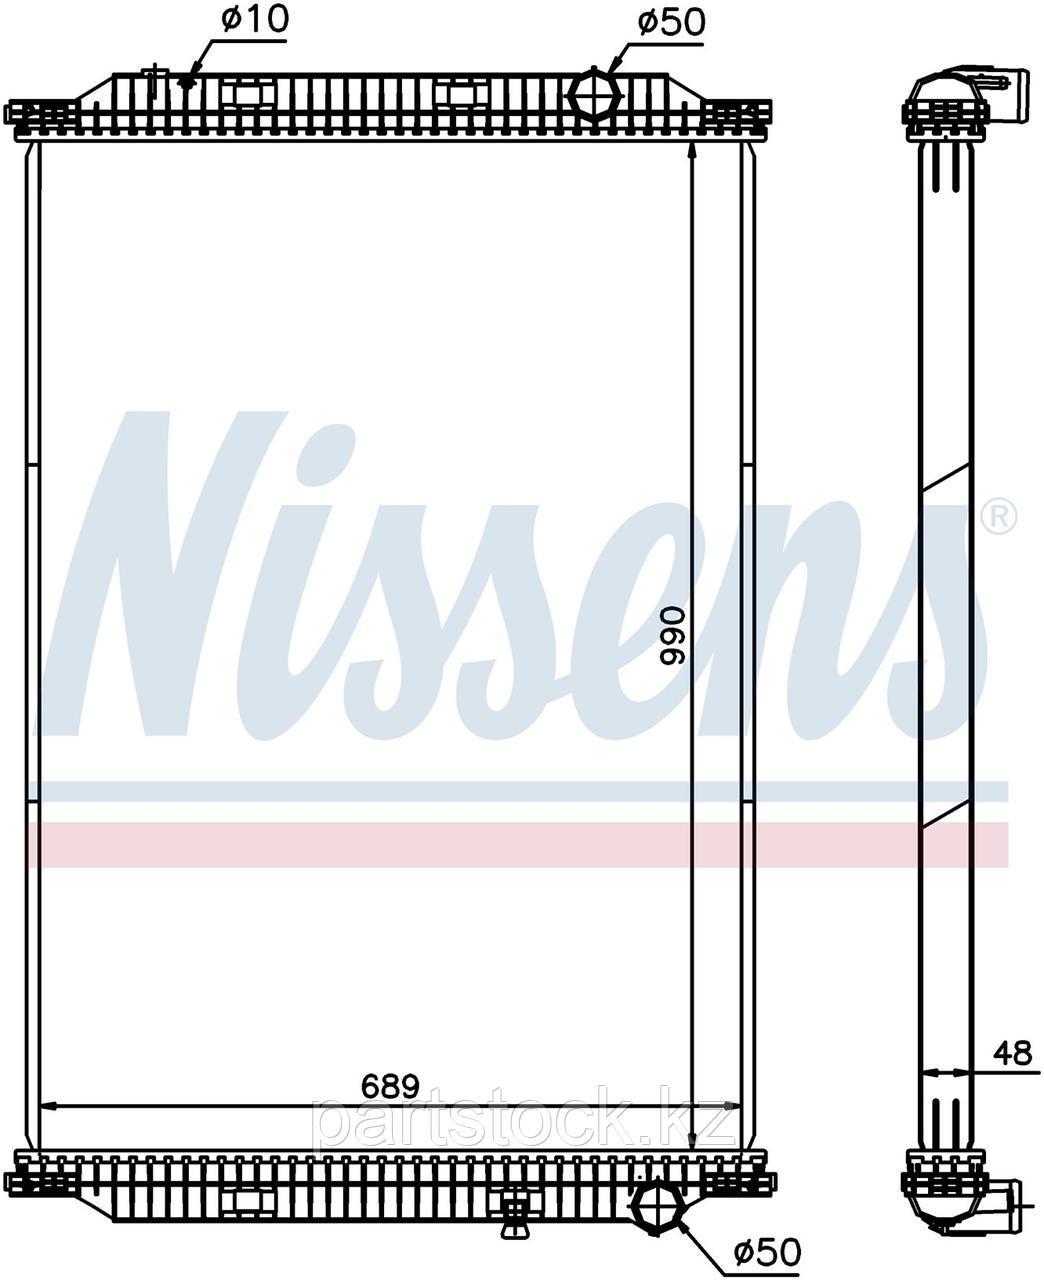 Радиатор водяной (без рамки пластик/алюминий )  990x689x48 на / для RENAULT, РЕНО, NISSENS 637850